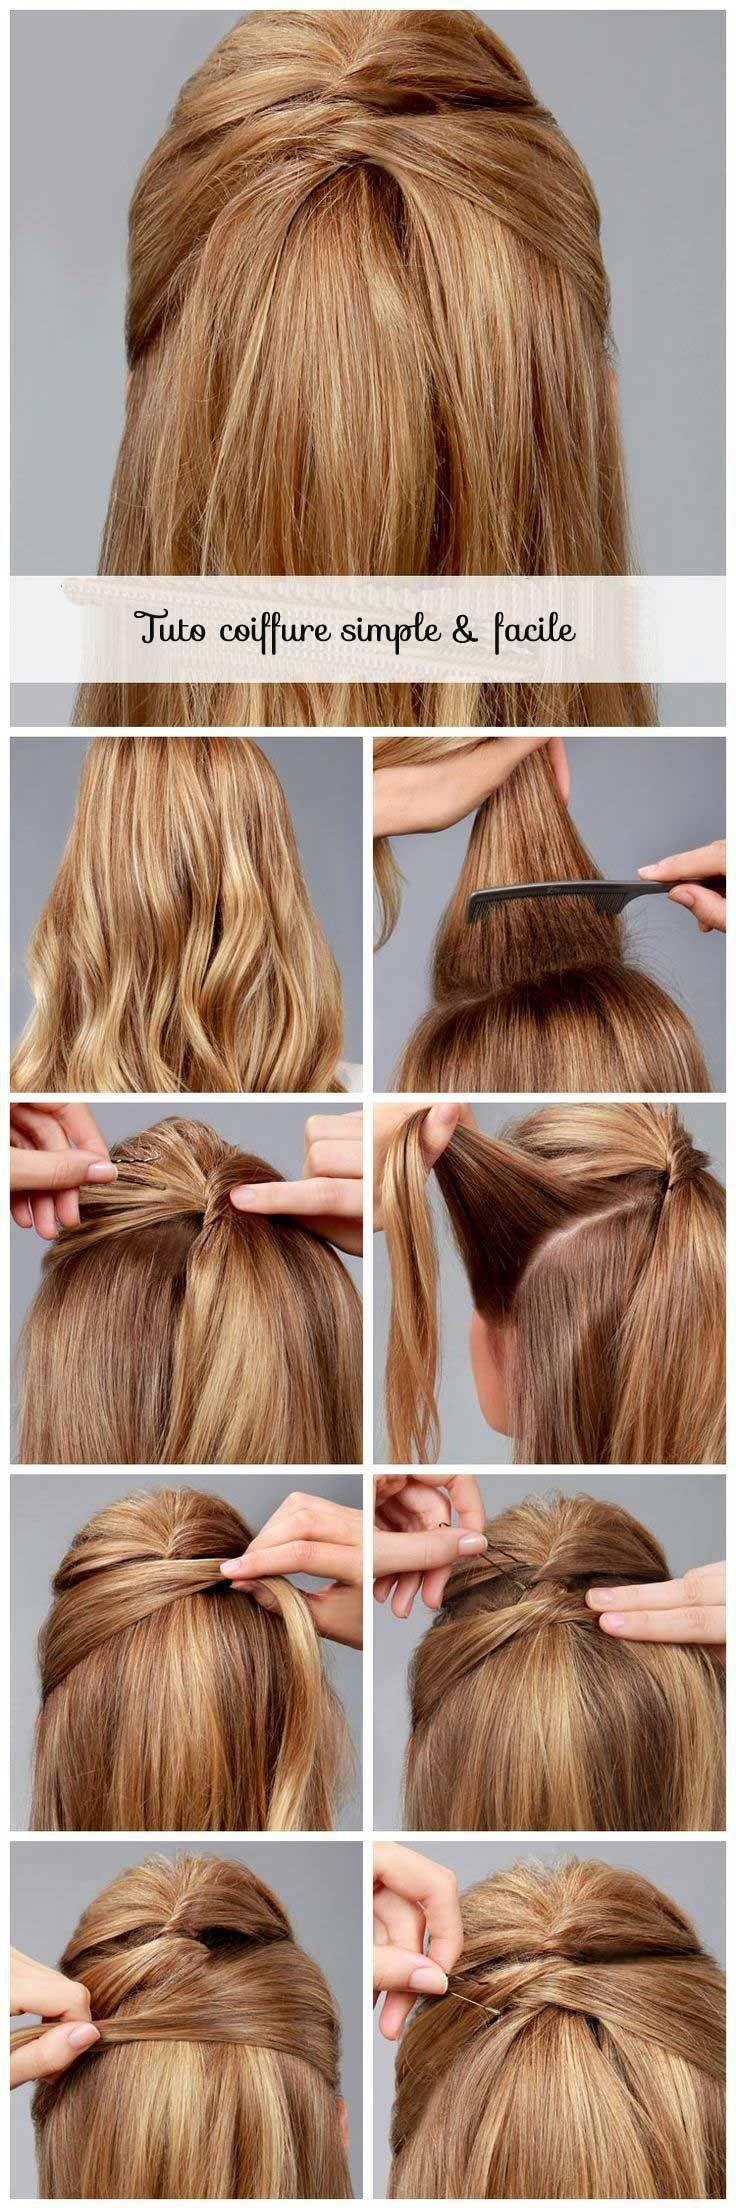 Tuto Coiffure Facile Cheveux Longs Courts Tuto Coiffure Coiffures Simples Coiffure Avec Headband